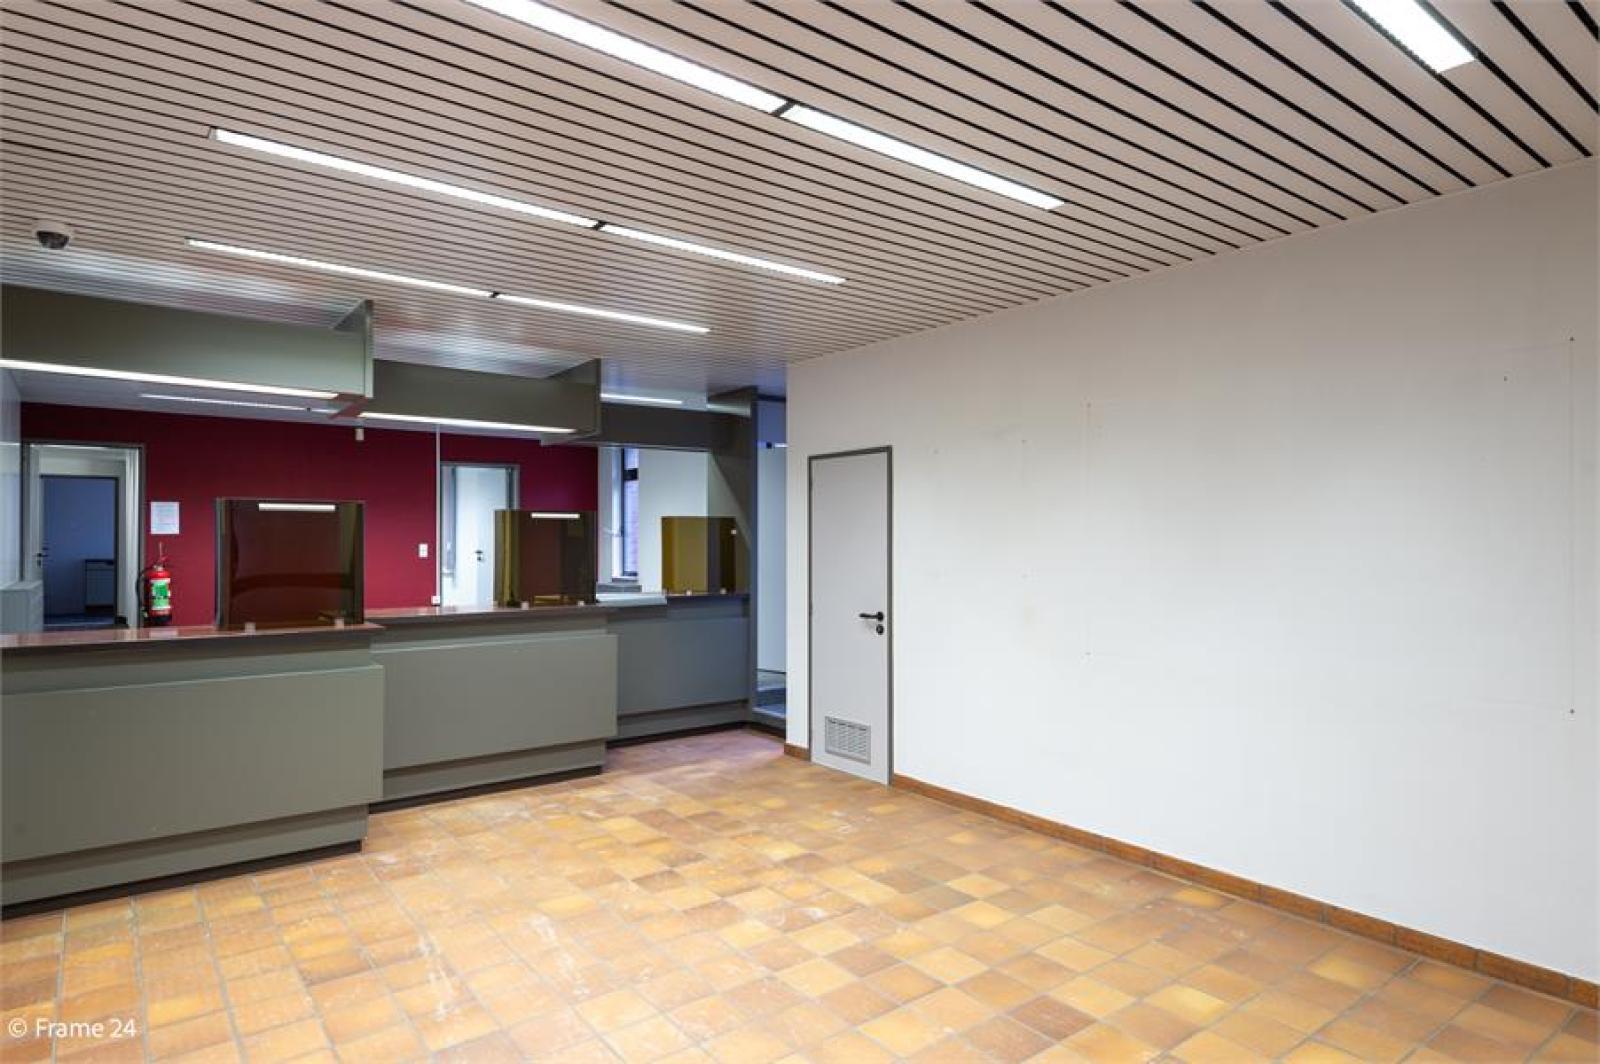 Handelsruimte met riante triplex (200 m²) op centrale ligging te Edegem! afbeelding 2